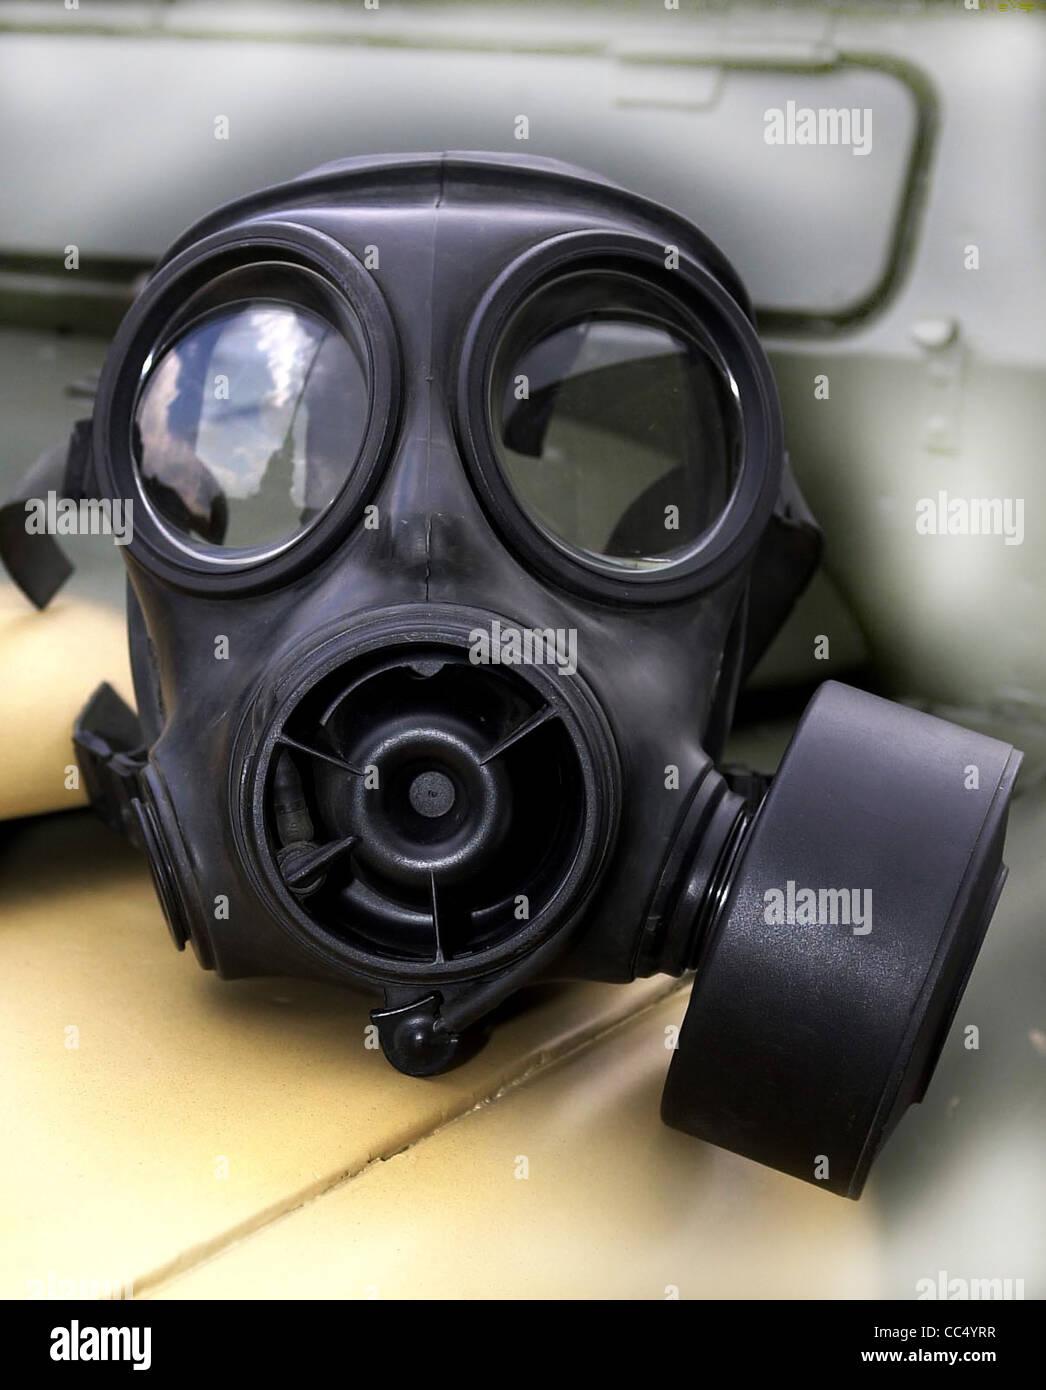 Respirators - Gas Masks - military surplus equipment  This